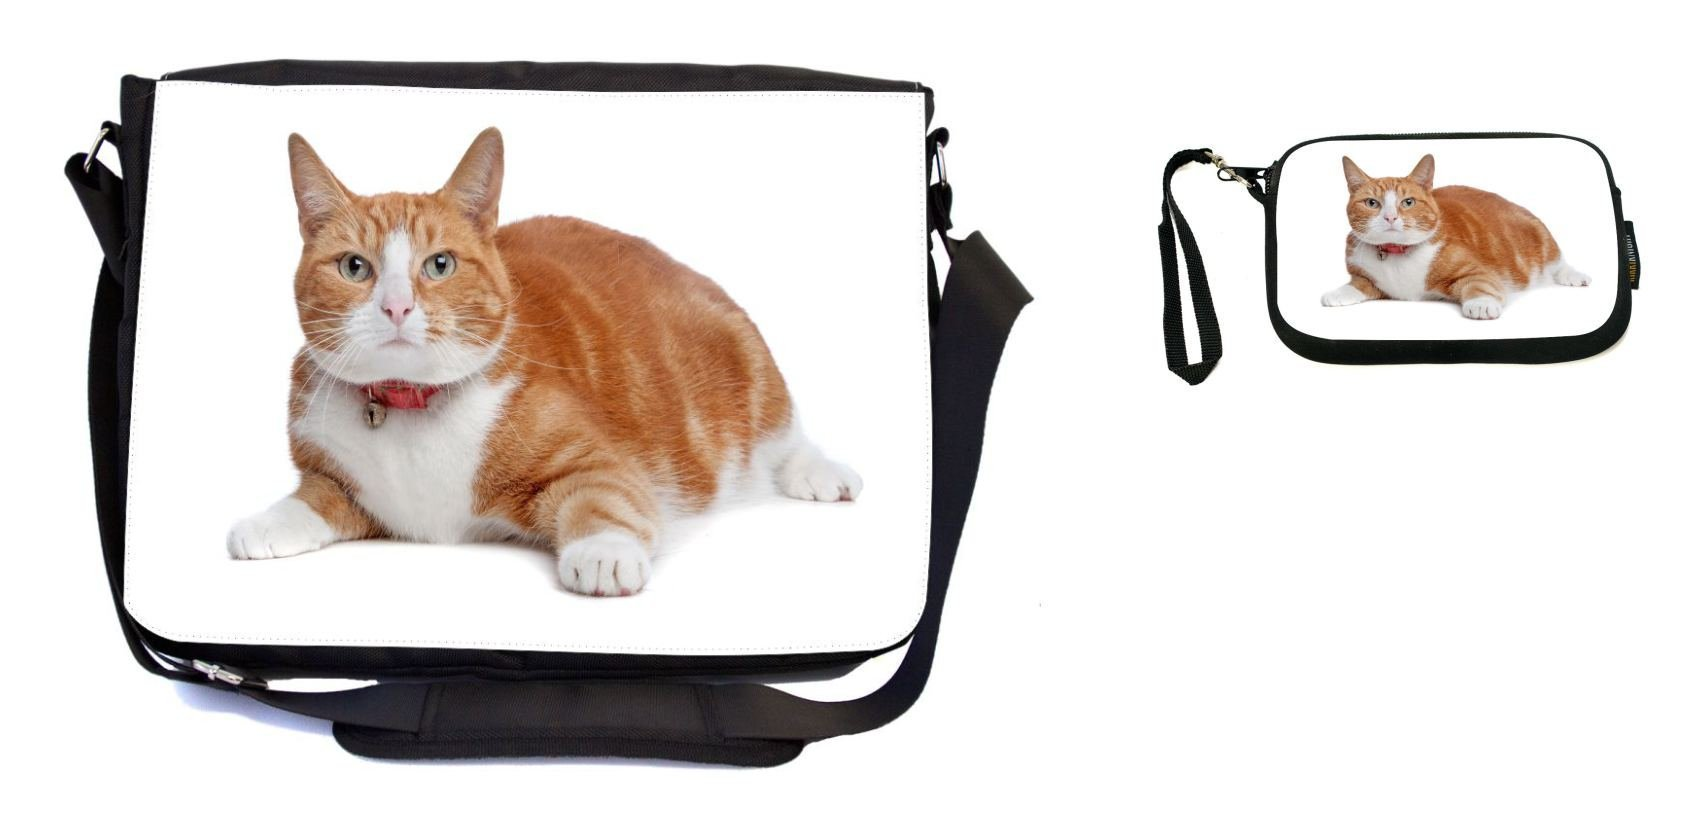 Rikki Knight European Short Haired Ginger and White Cat Design Messenger Bag - School Bag - Laptop Bag - with Padded Insert - Includes UKBK Premium Coin Purse